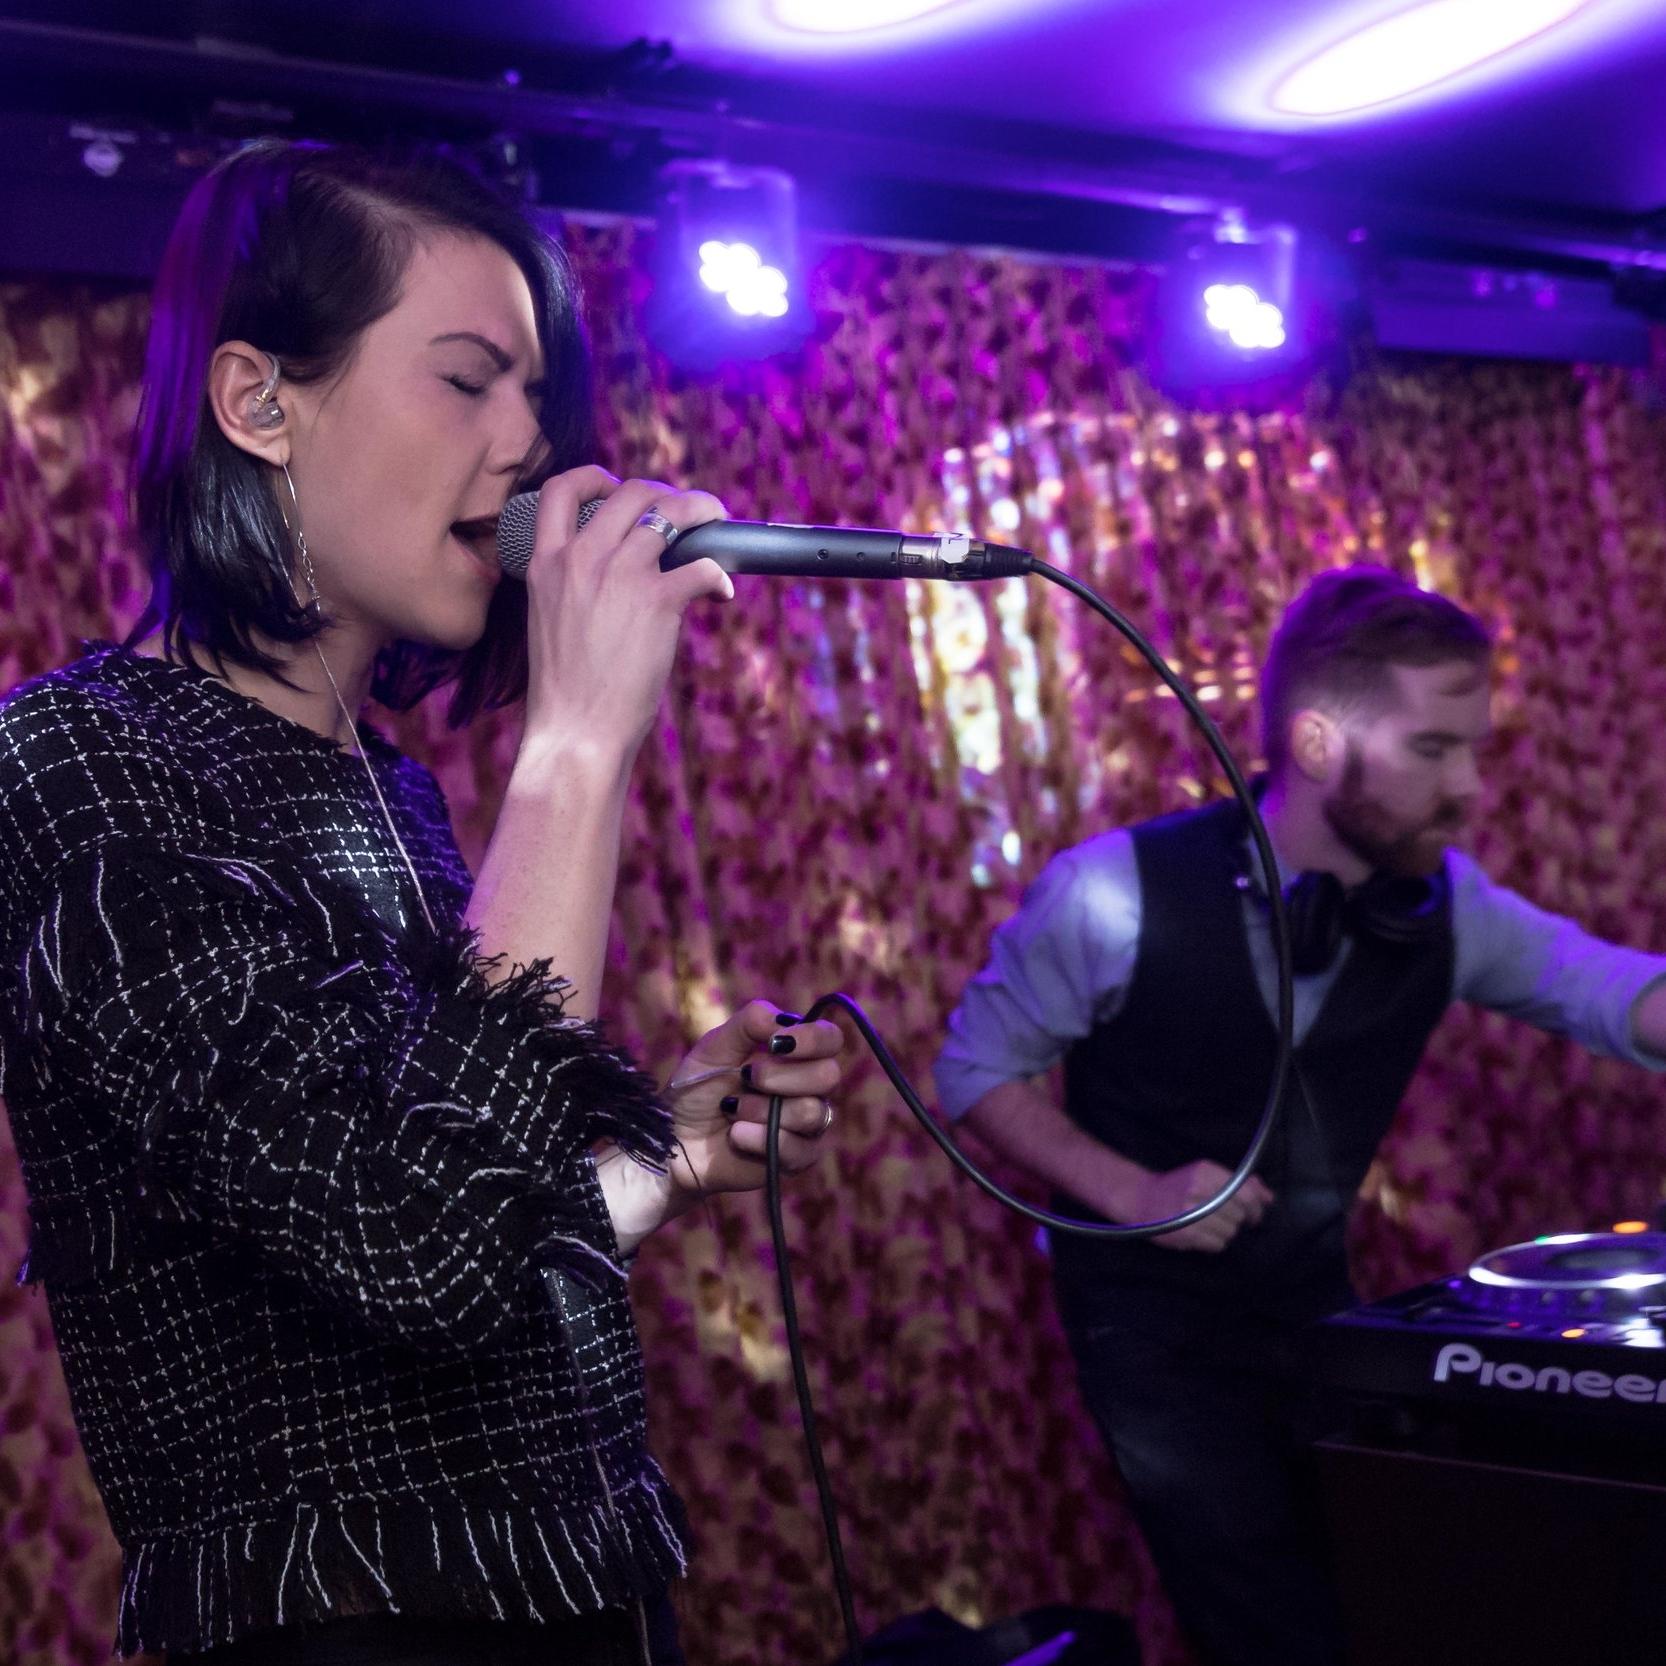 Hybrid Live/DJ set with Kim Sykes from Senseless